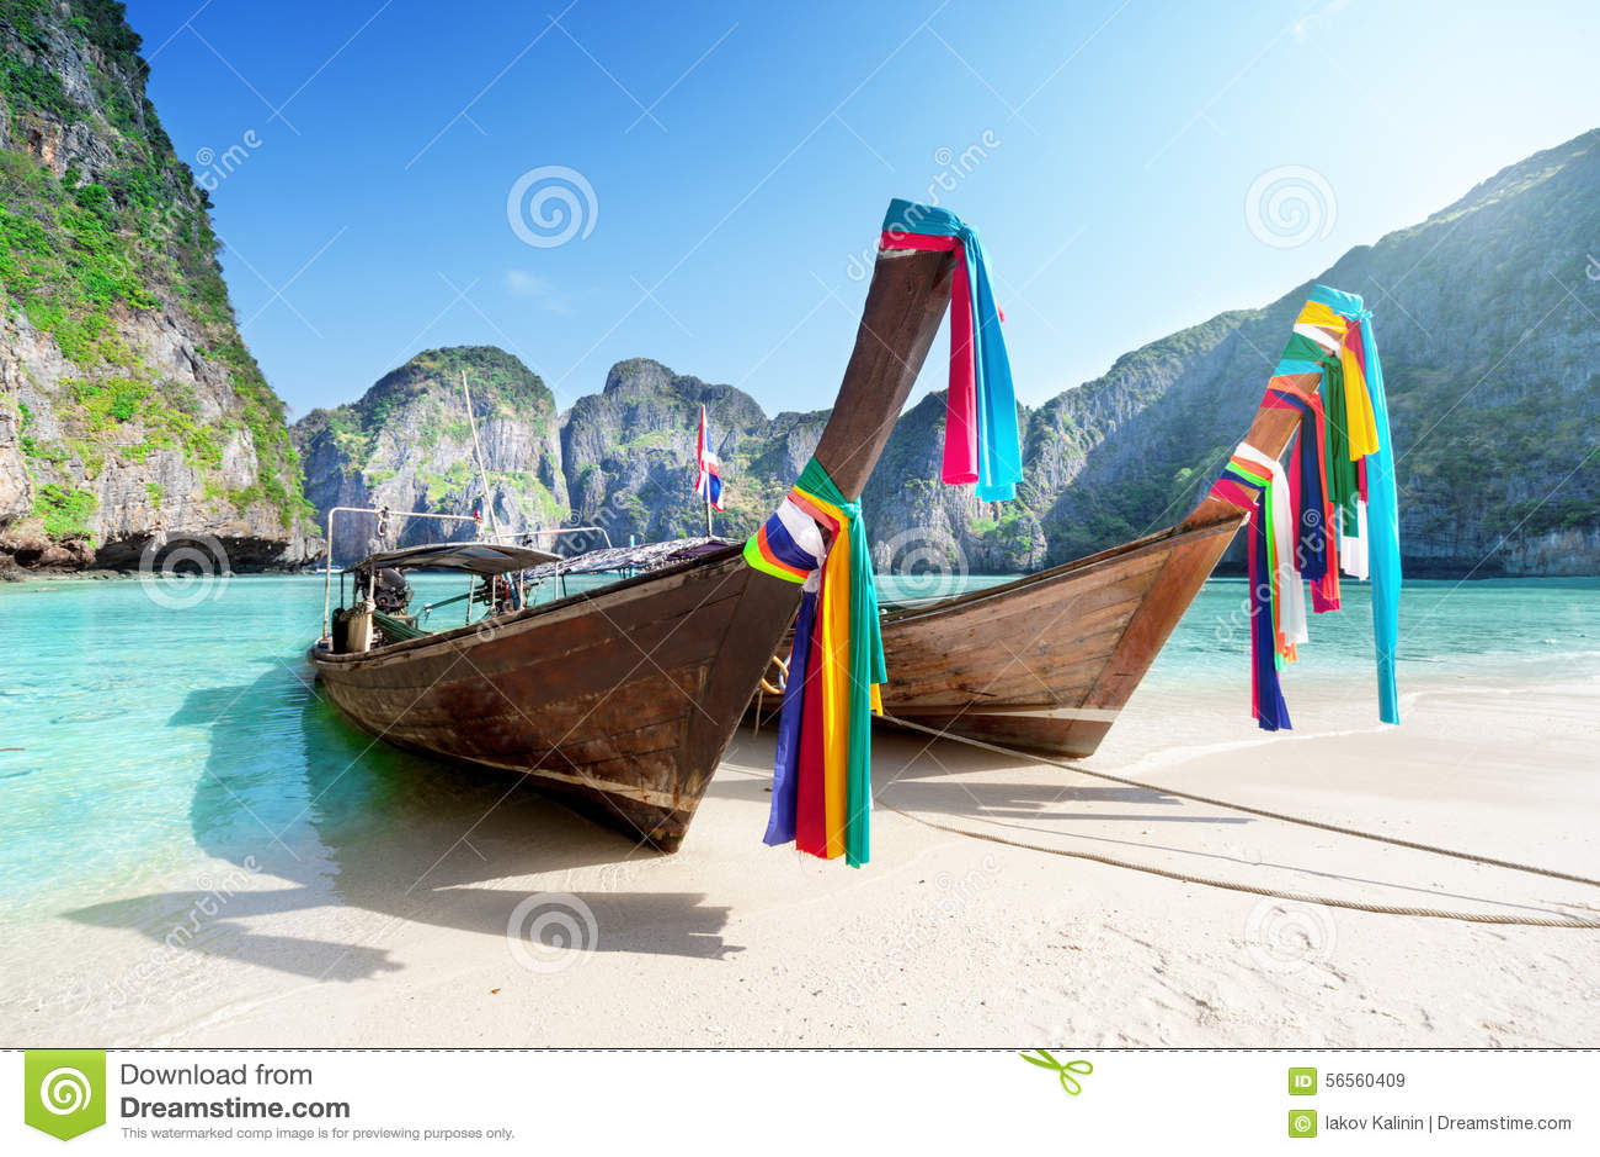 Download Phi κόλπων της Maya Phi νησί Leh, Ταϊλάνδη Στοκ Εικόνα - εικόνα από βακκινίων, φύση: 56560409